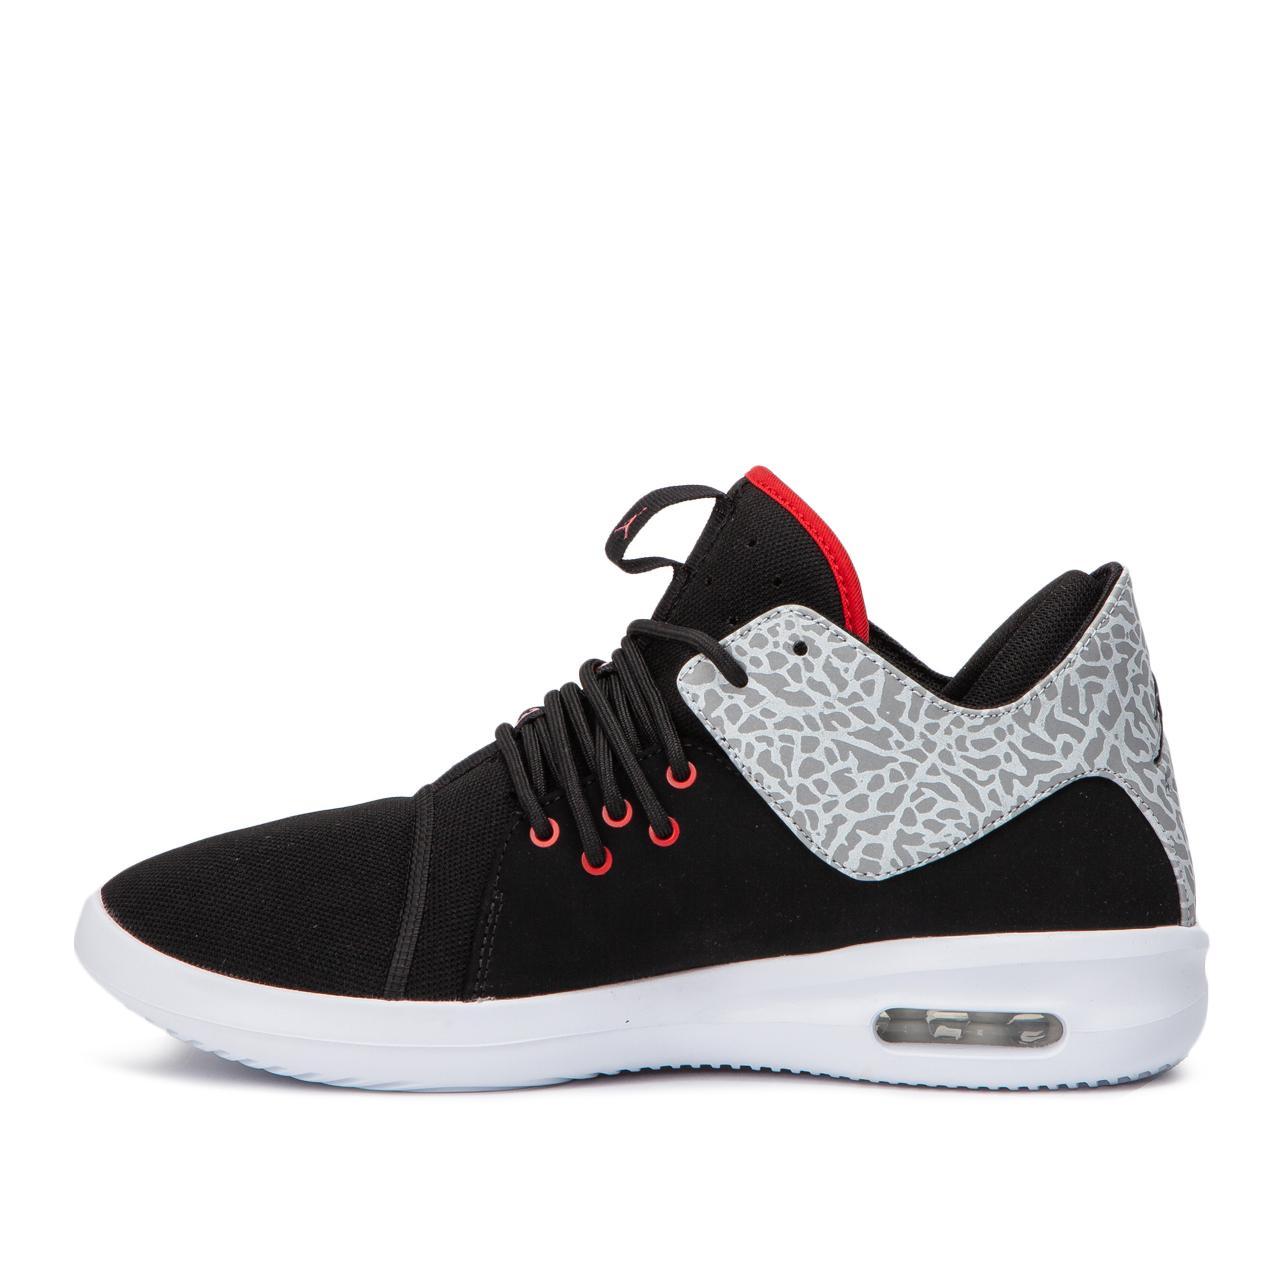 Nike Leather Nike Air Jordan First Class in Black for Men - Lyst